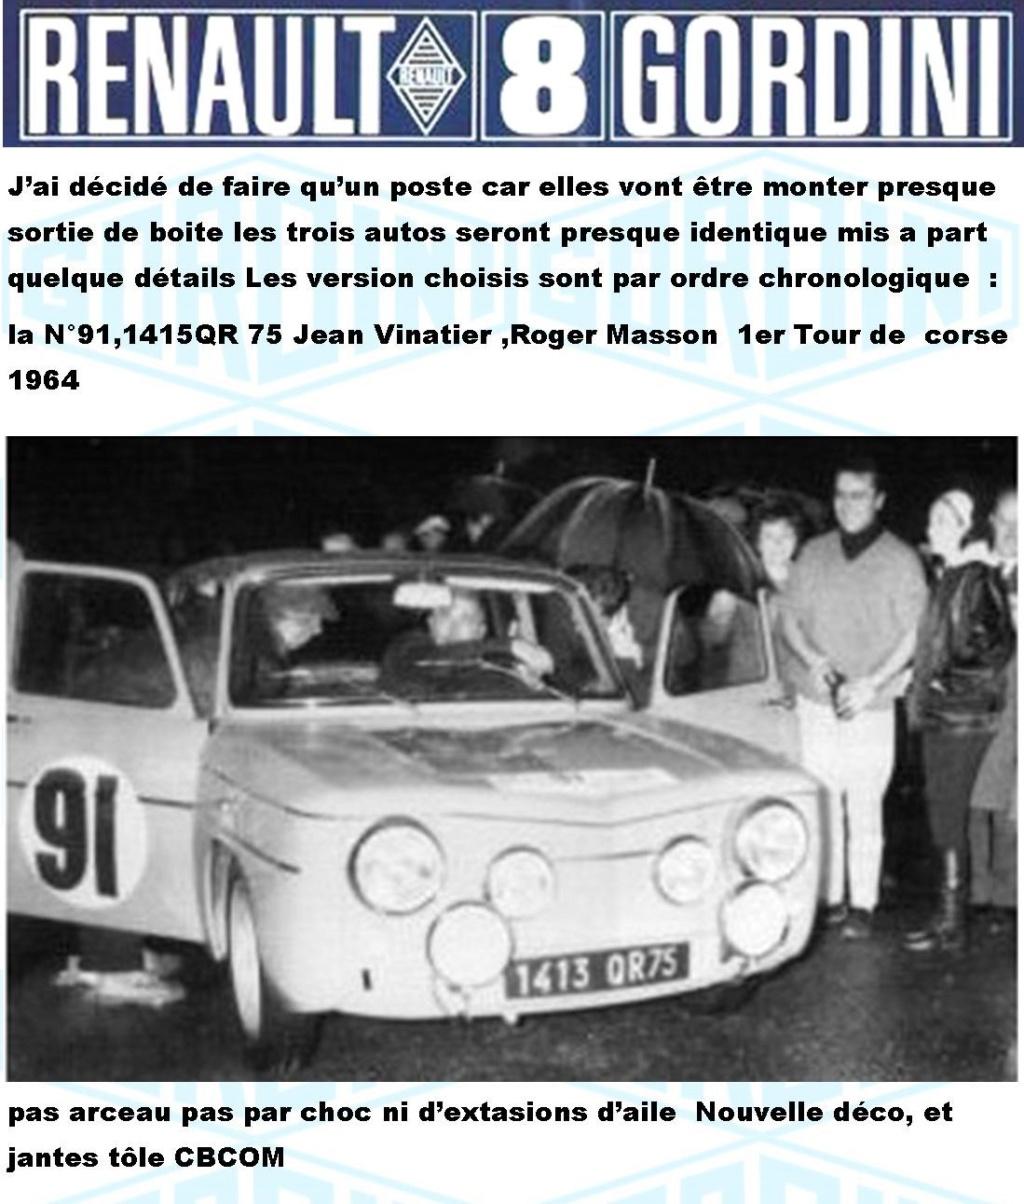 Trois Renault 8 gordini Heller 1/24 Image715